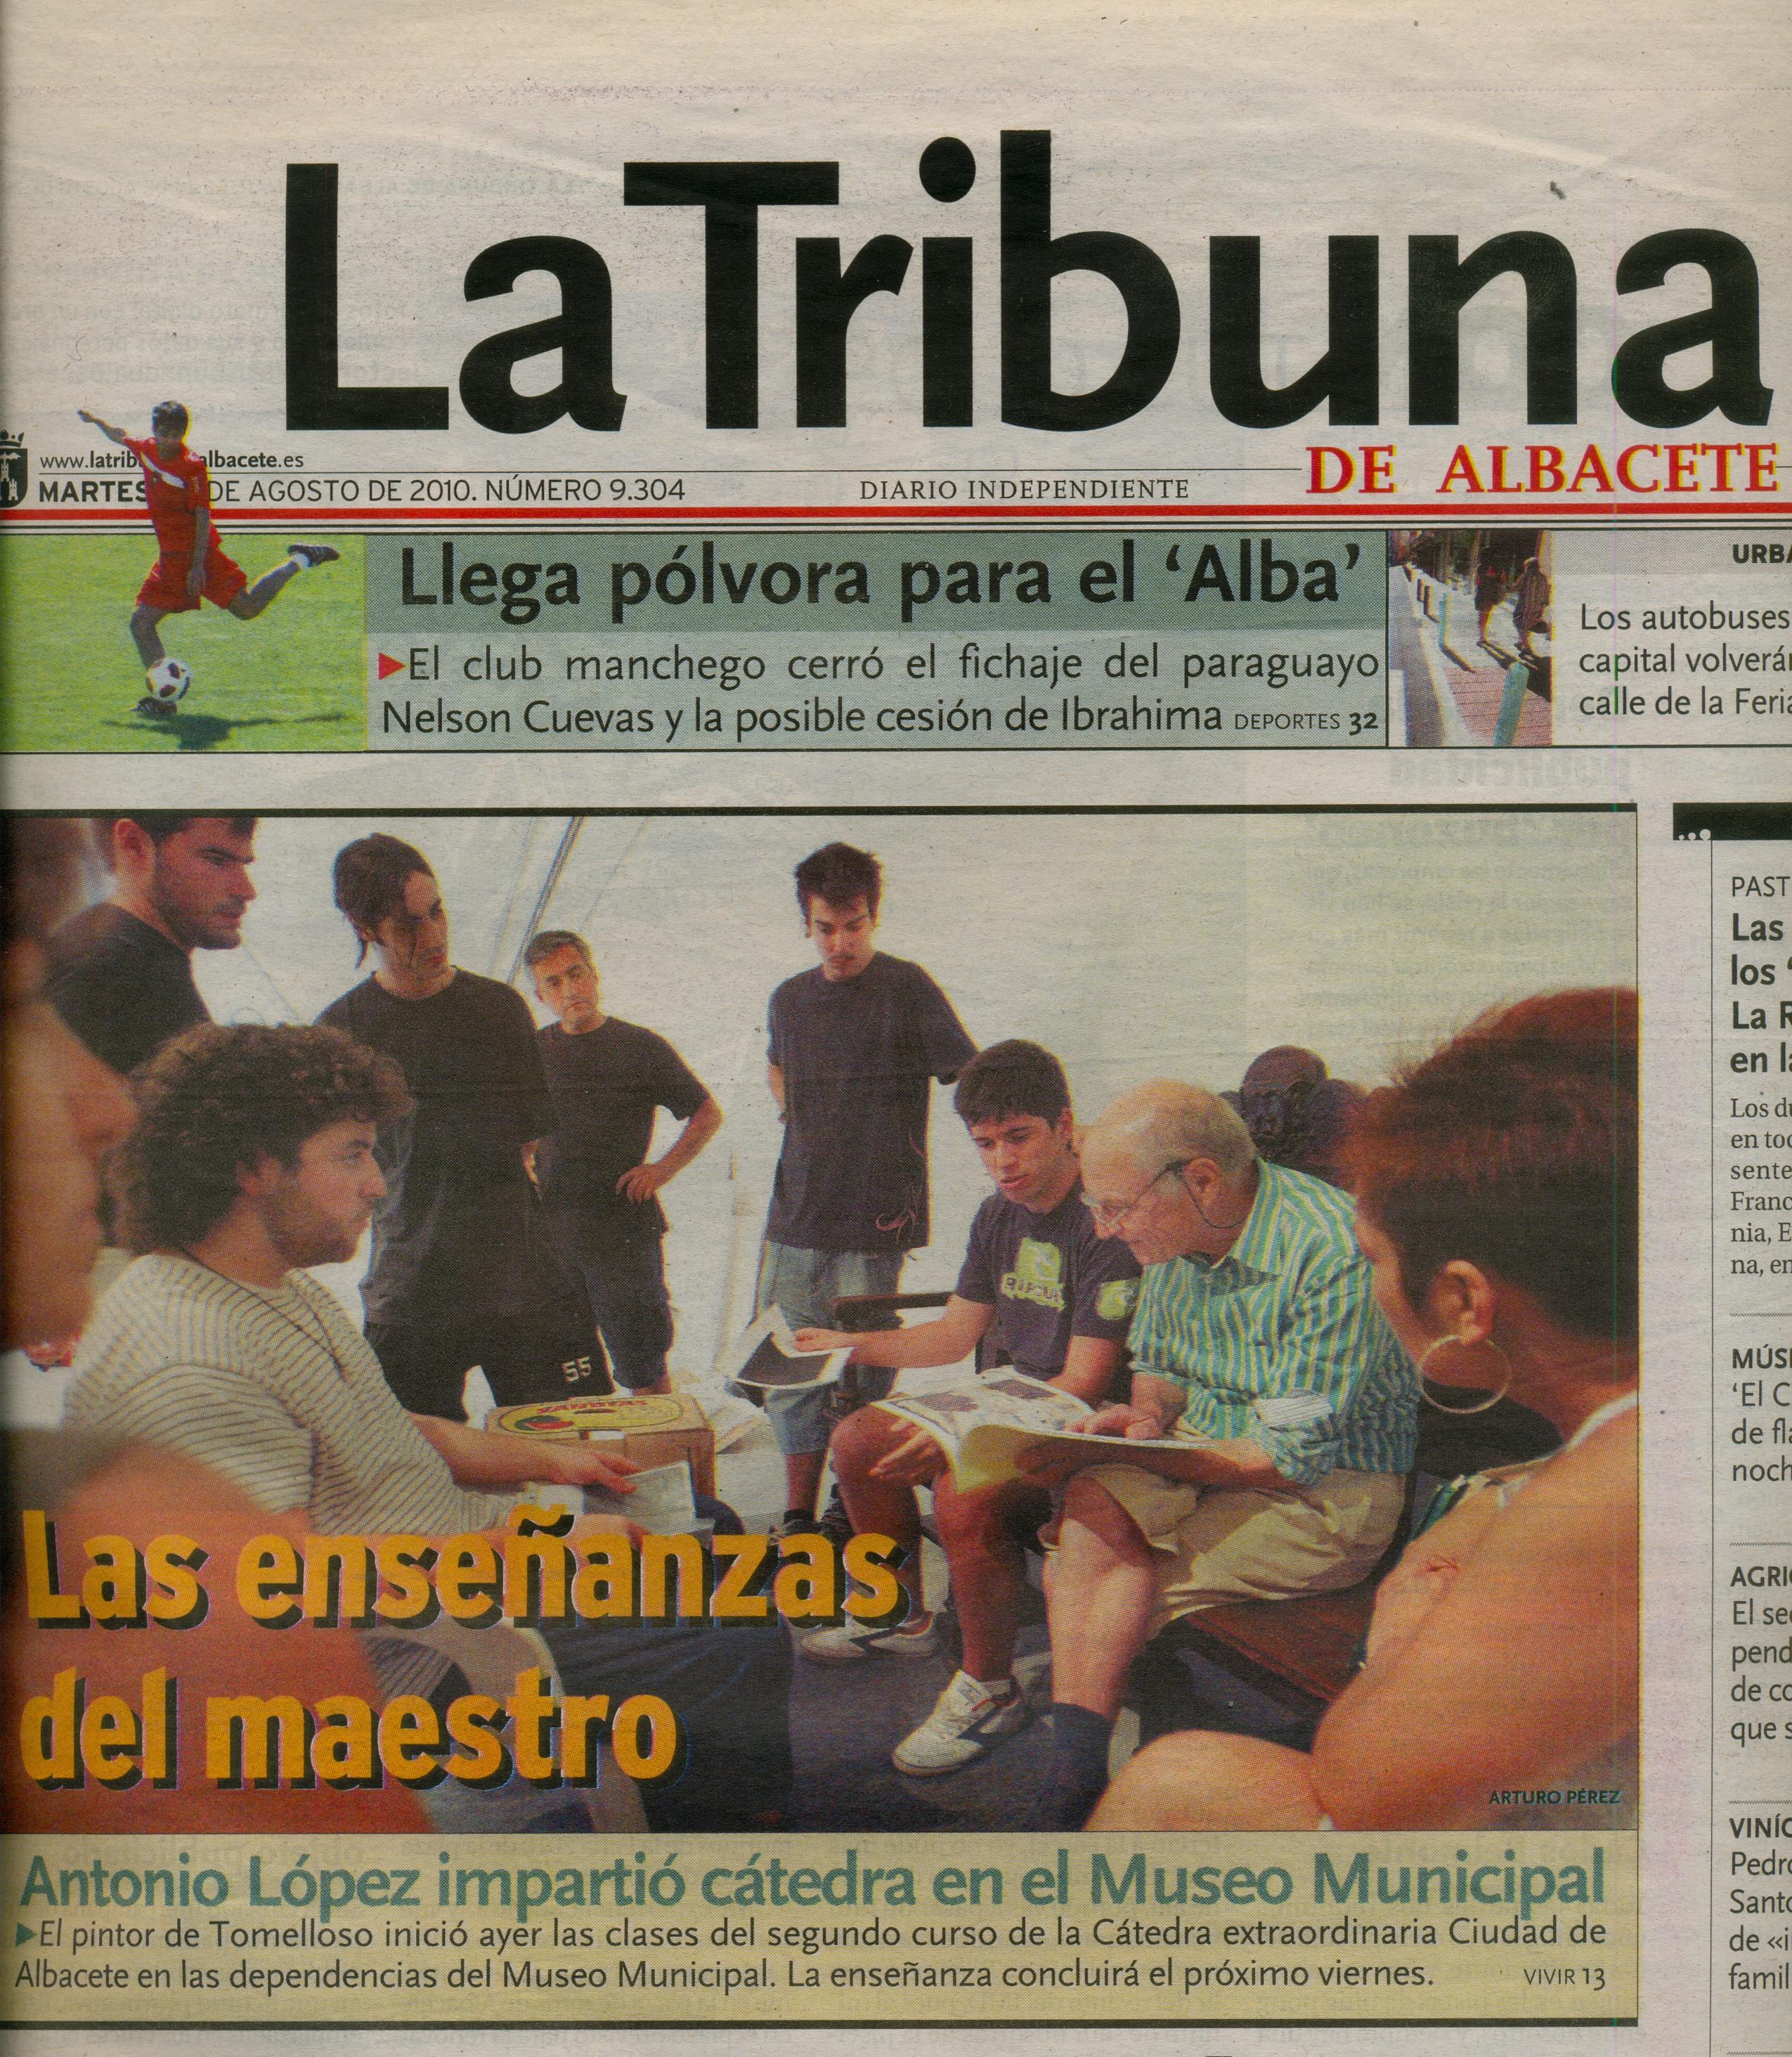 La Tribuna de Albacete 2010